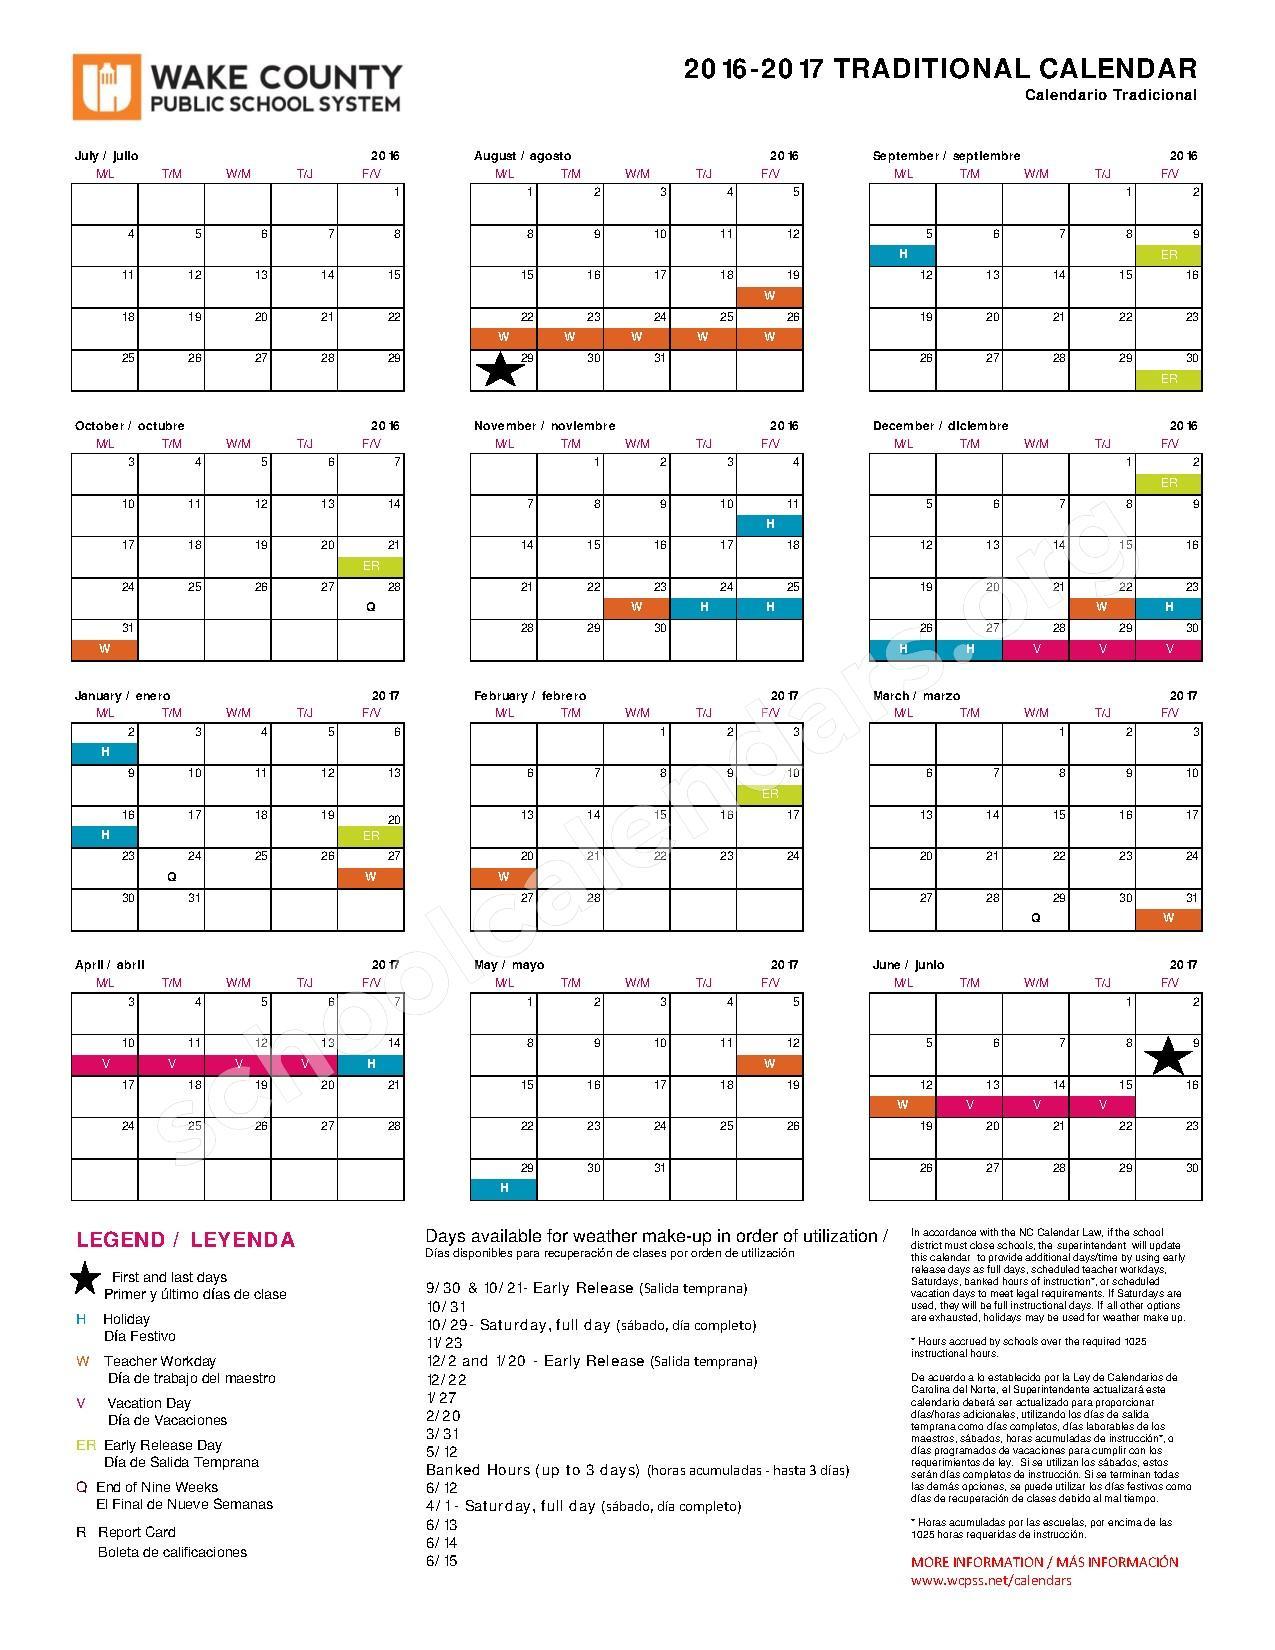 Durham Public Schools Year Round Calendar For Durham Public School Traditional Calendar